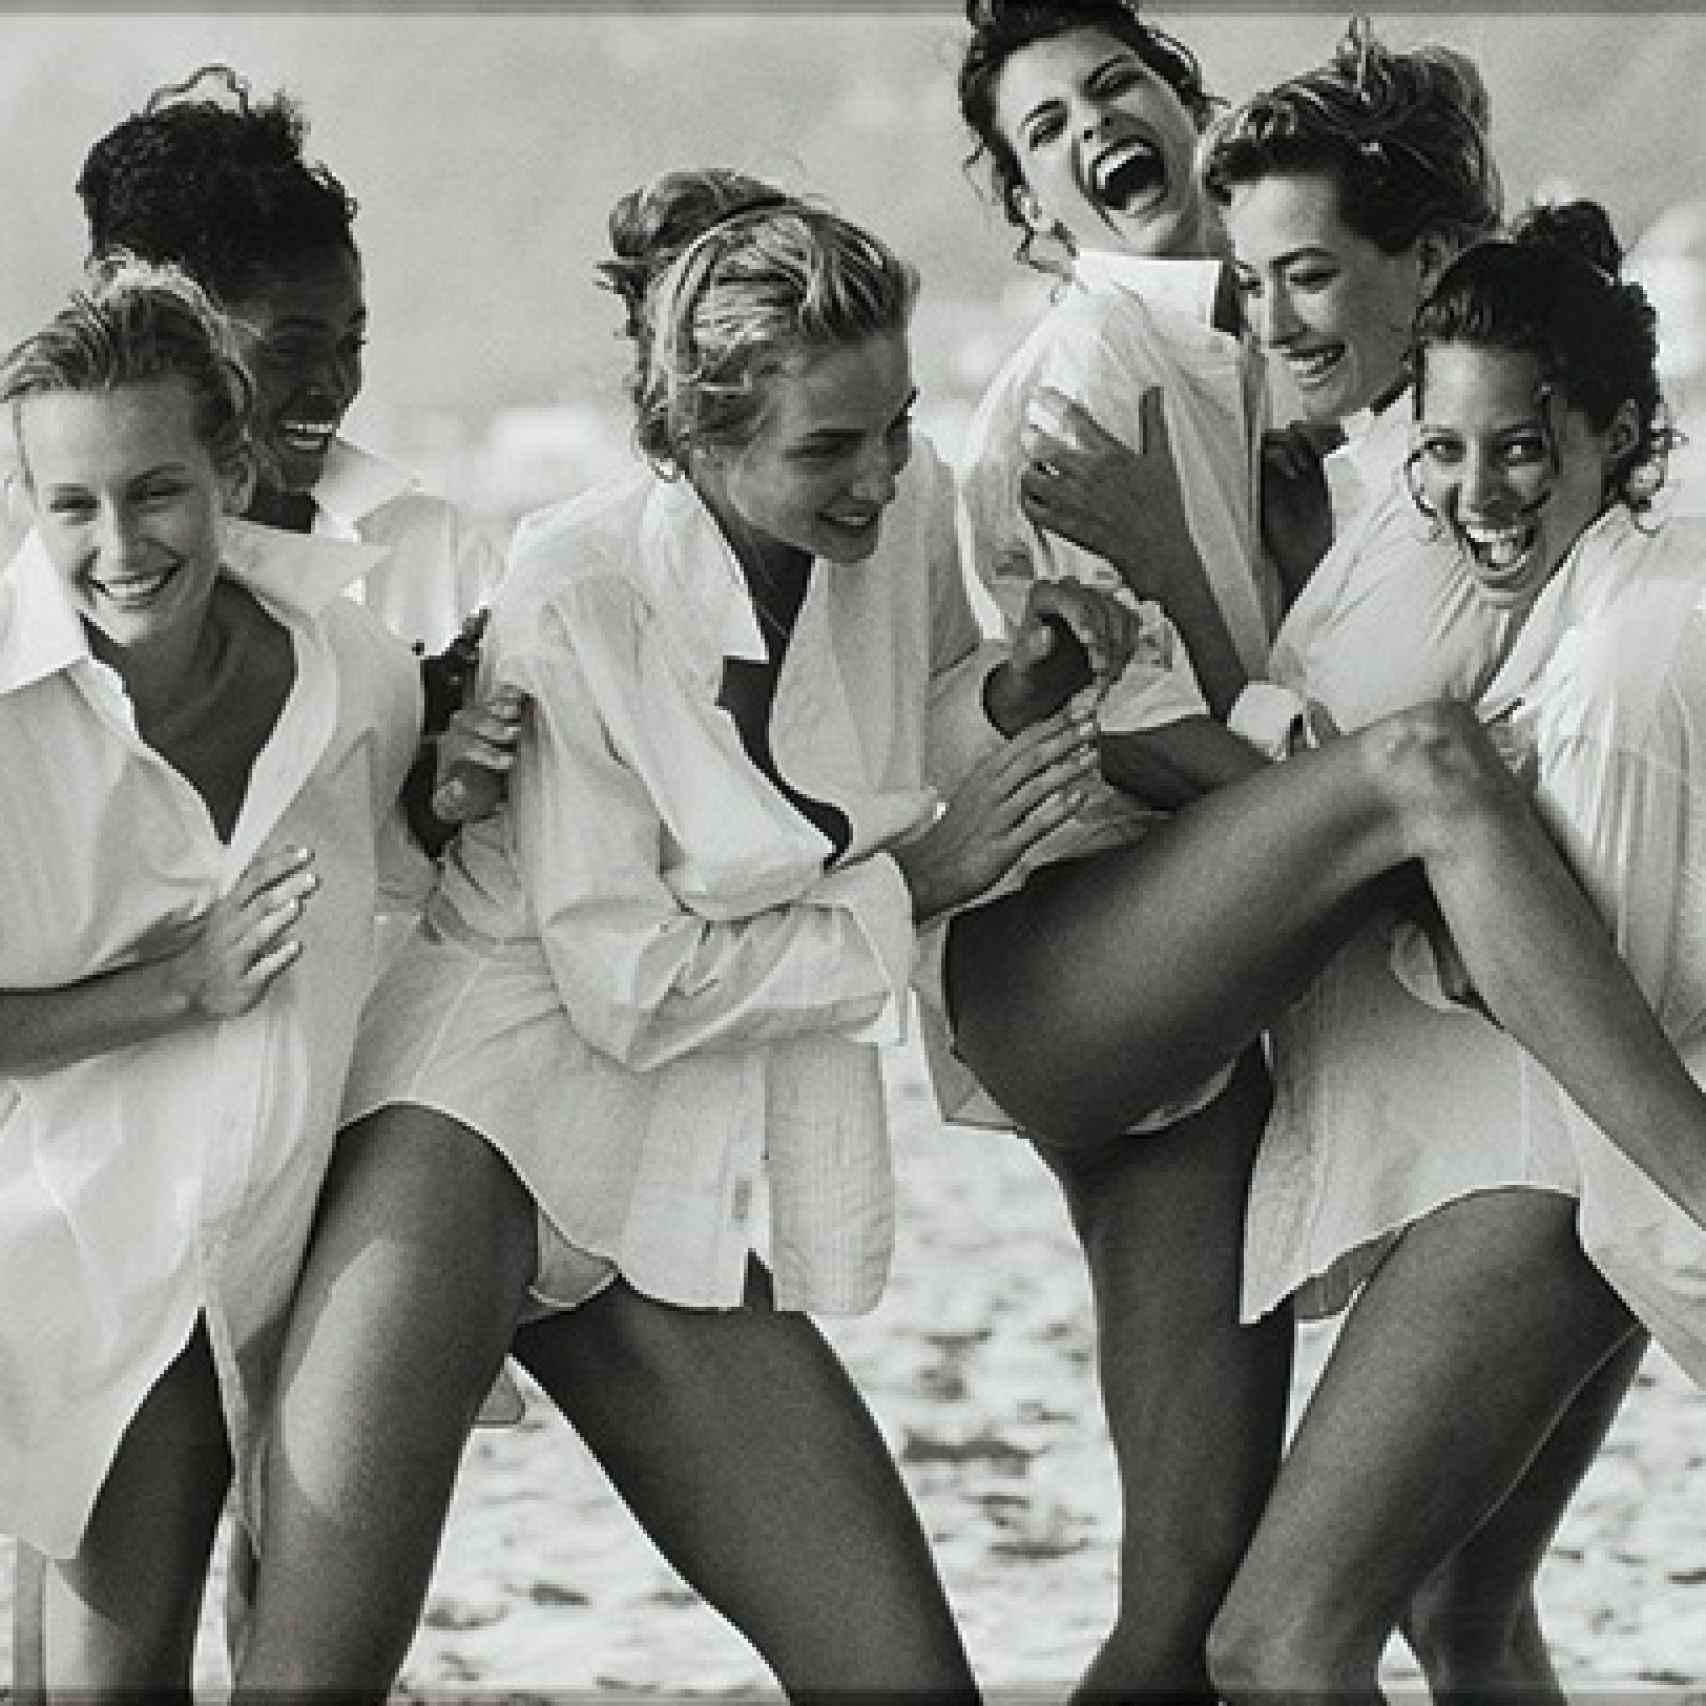 Linda Evangelista y Christy Turlington entre las supermodelos fotografiadas por Lindbergh